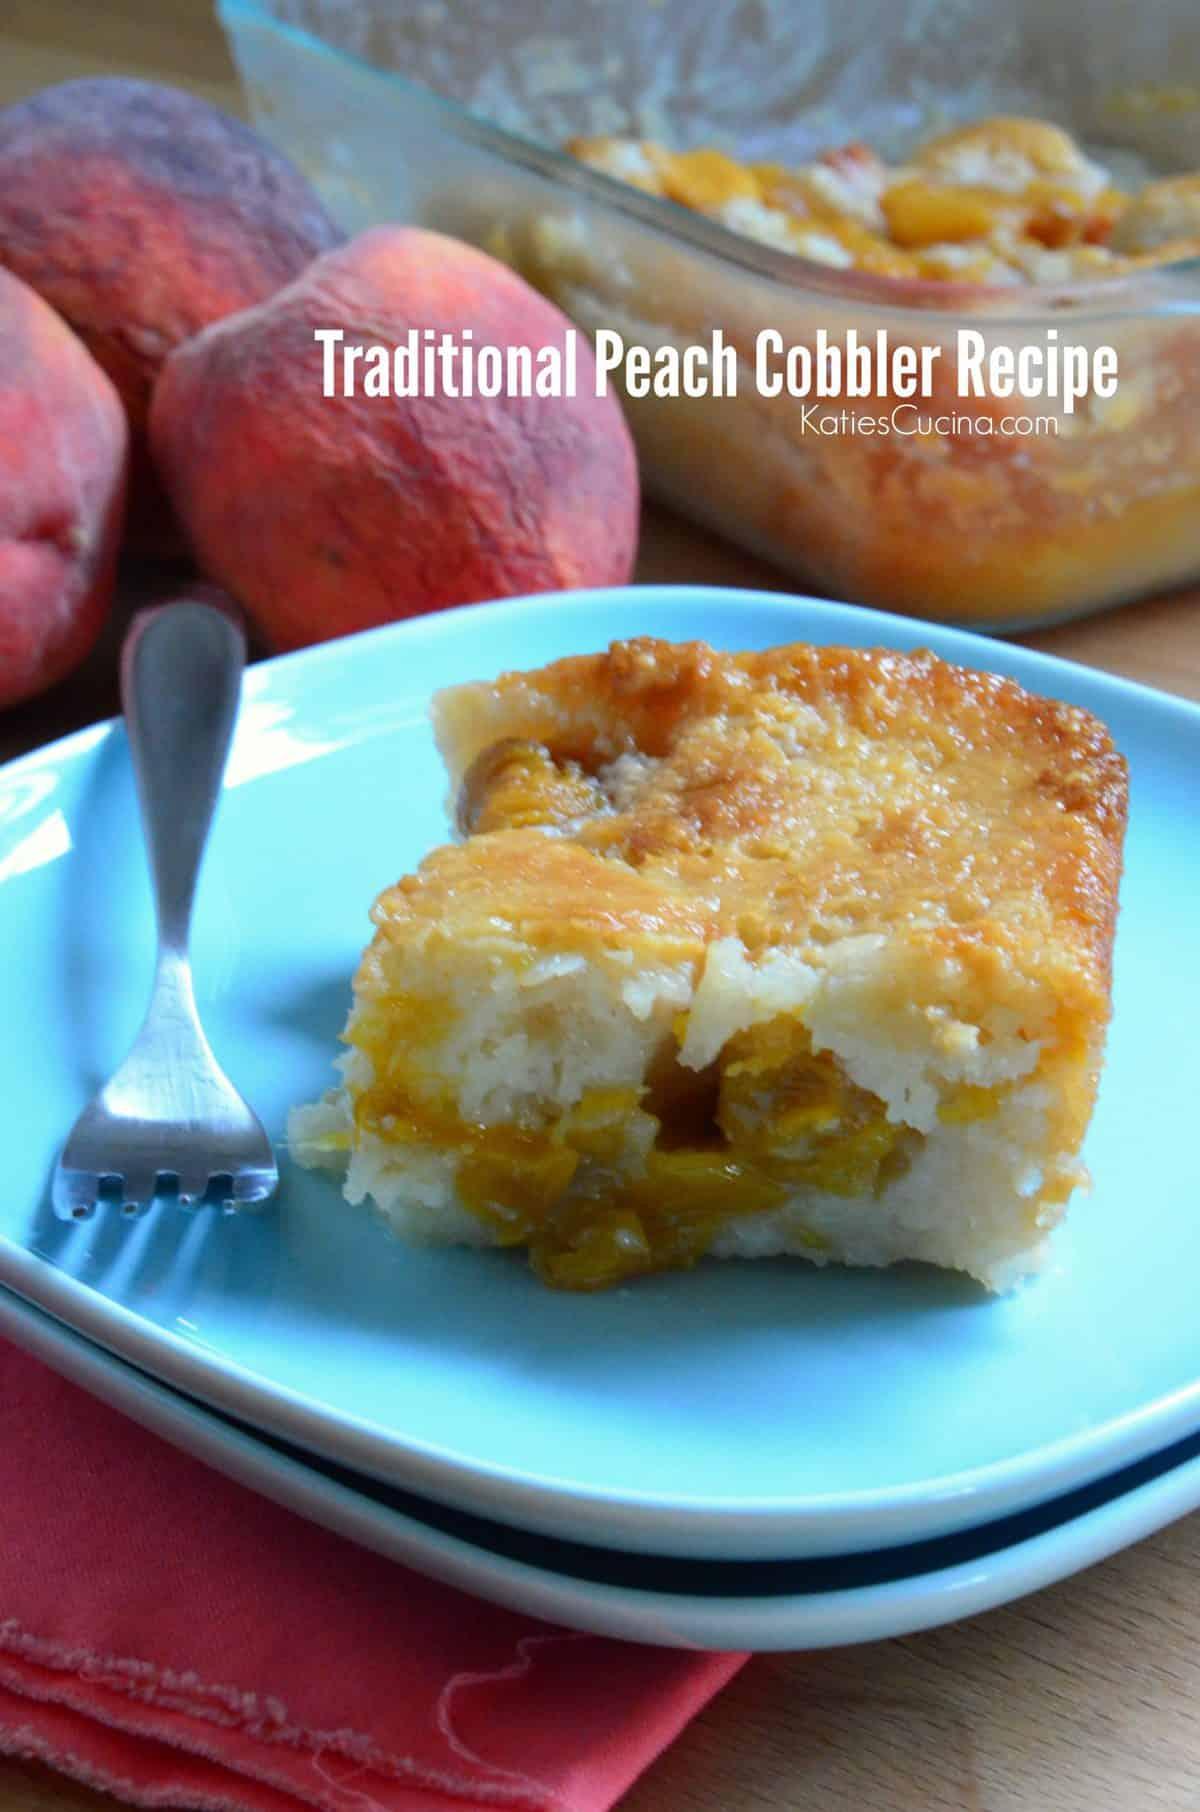 Traditional Peach Cobbler Recipe